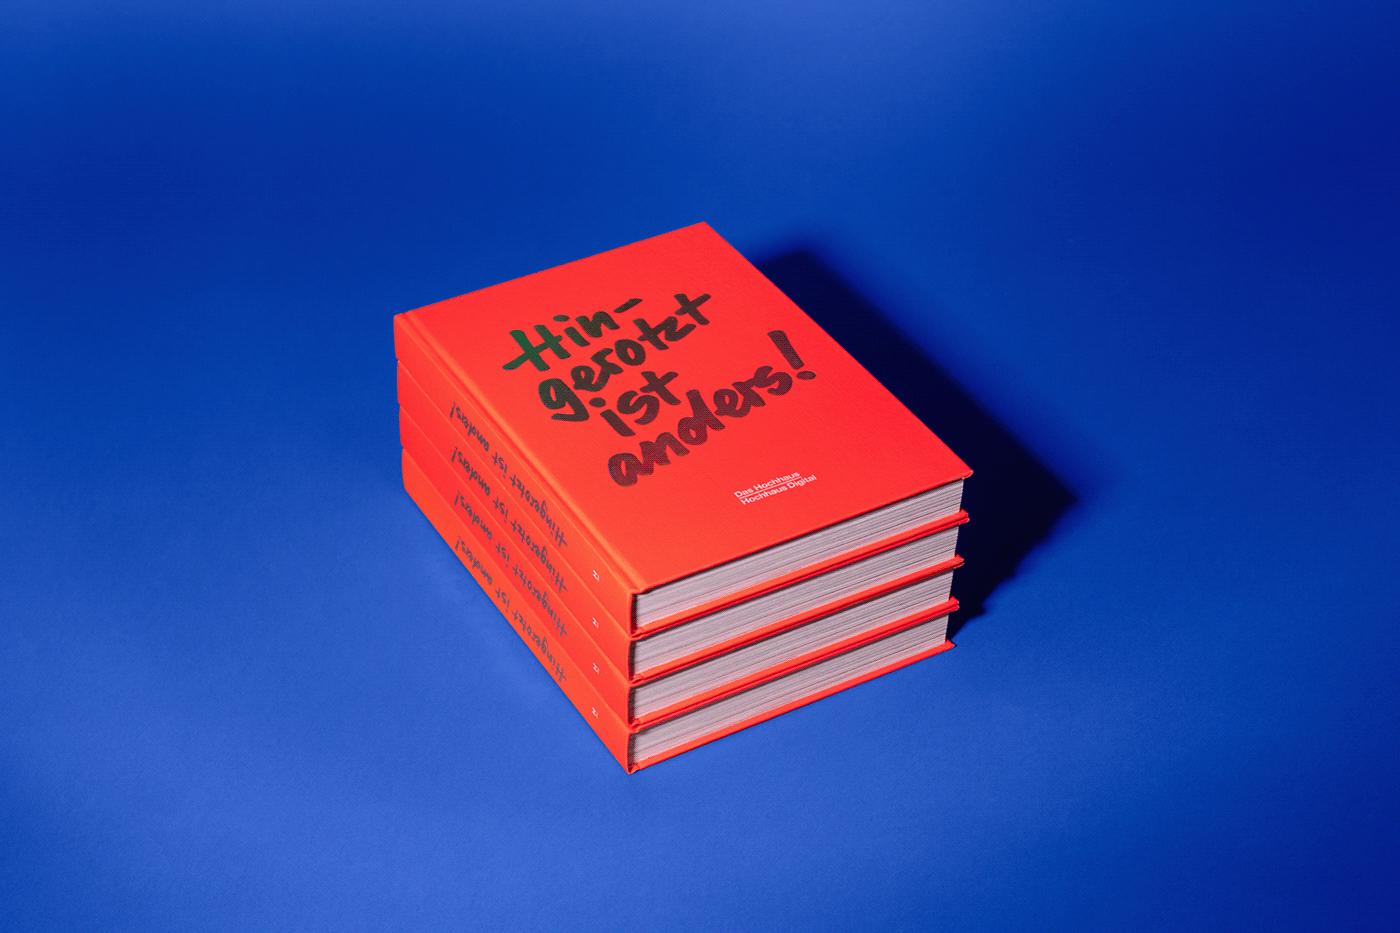 book bookcover coverdesign Handlettering lettering Title